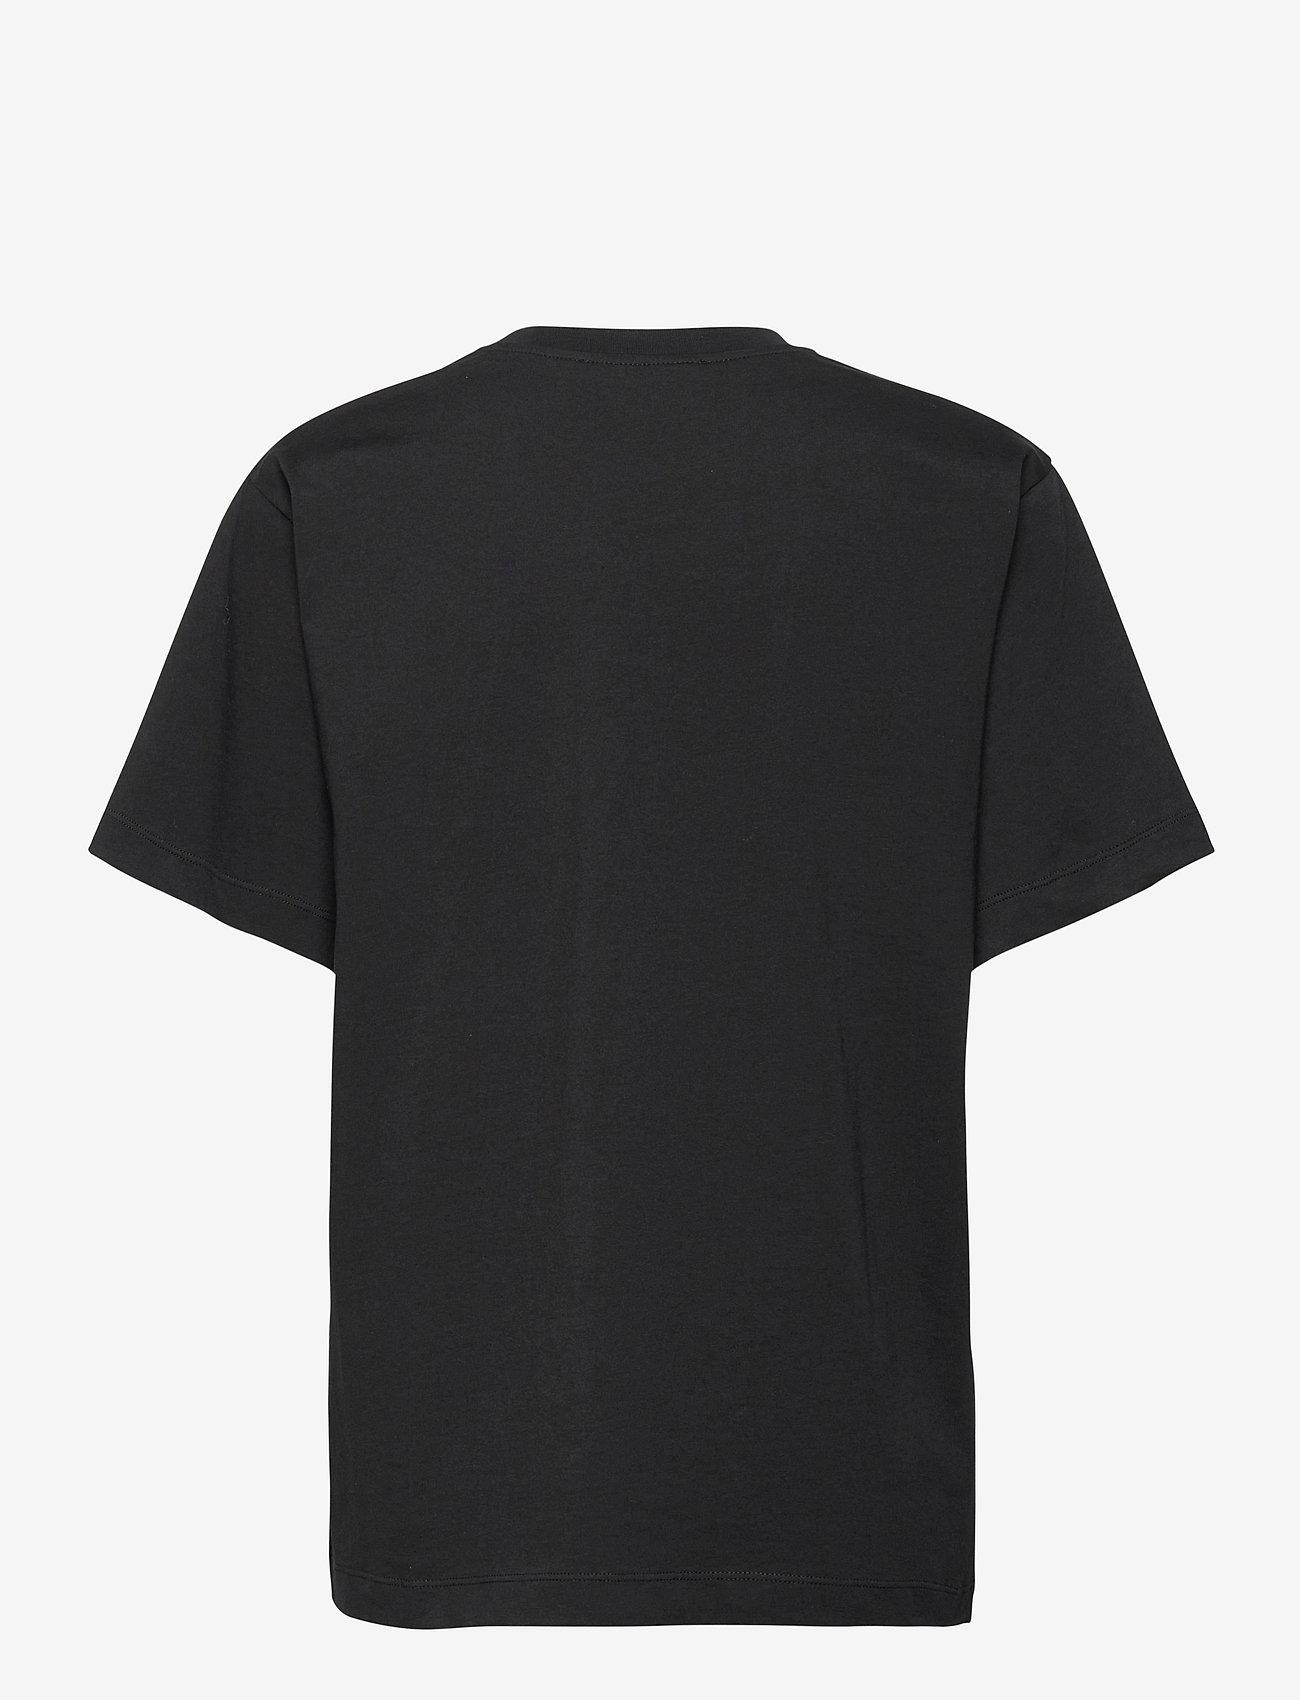 Boutique Moschino - BOTANIC T-SHIRT - t-shirts - black fantasy print - 1